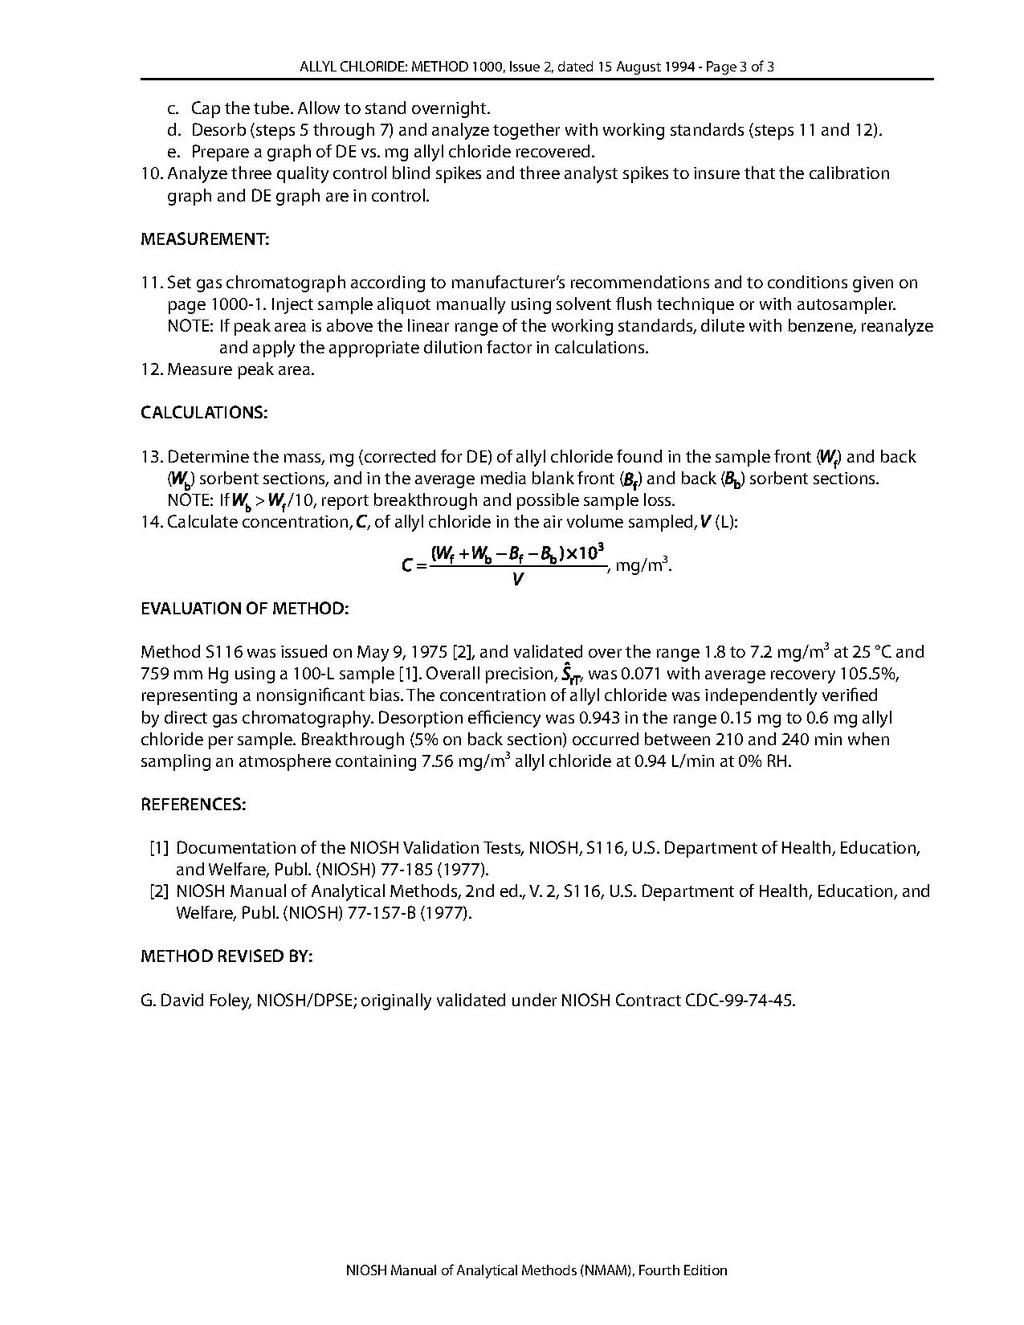 Page:NIOSH Manual of Analytical Methods - 1000 pdf/3